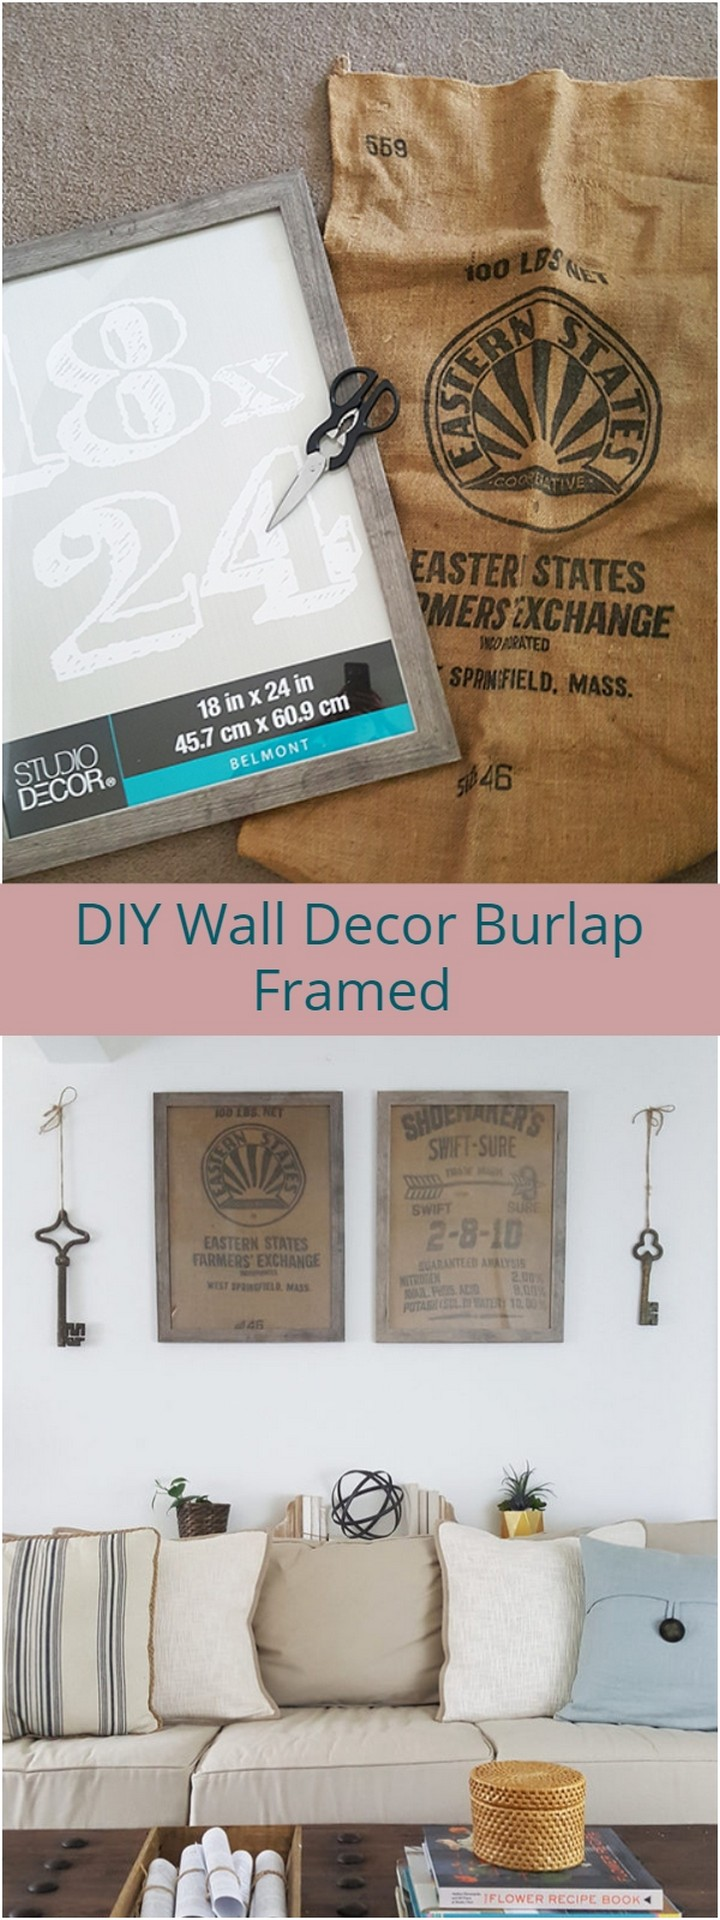 DIY Wall Decor Burlap Framed 1